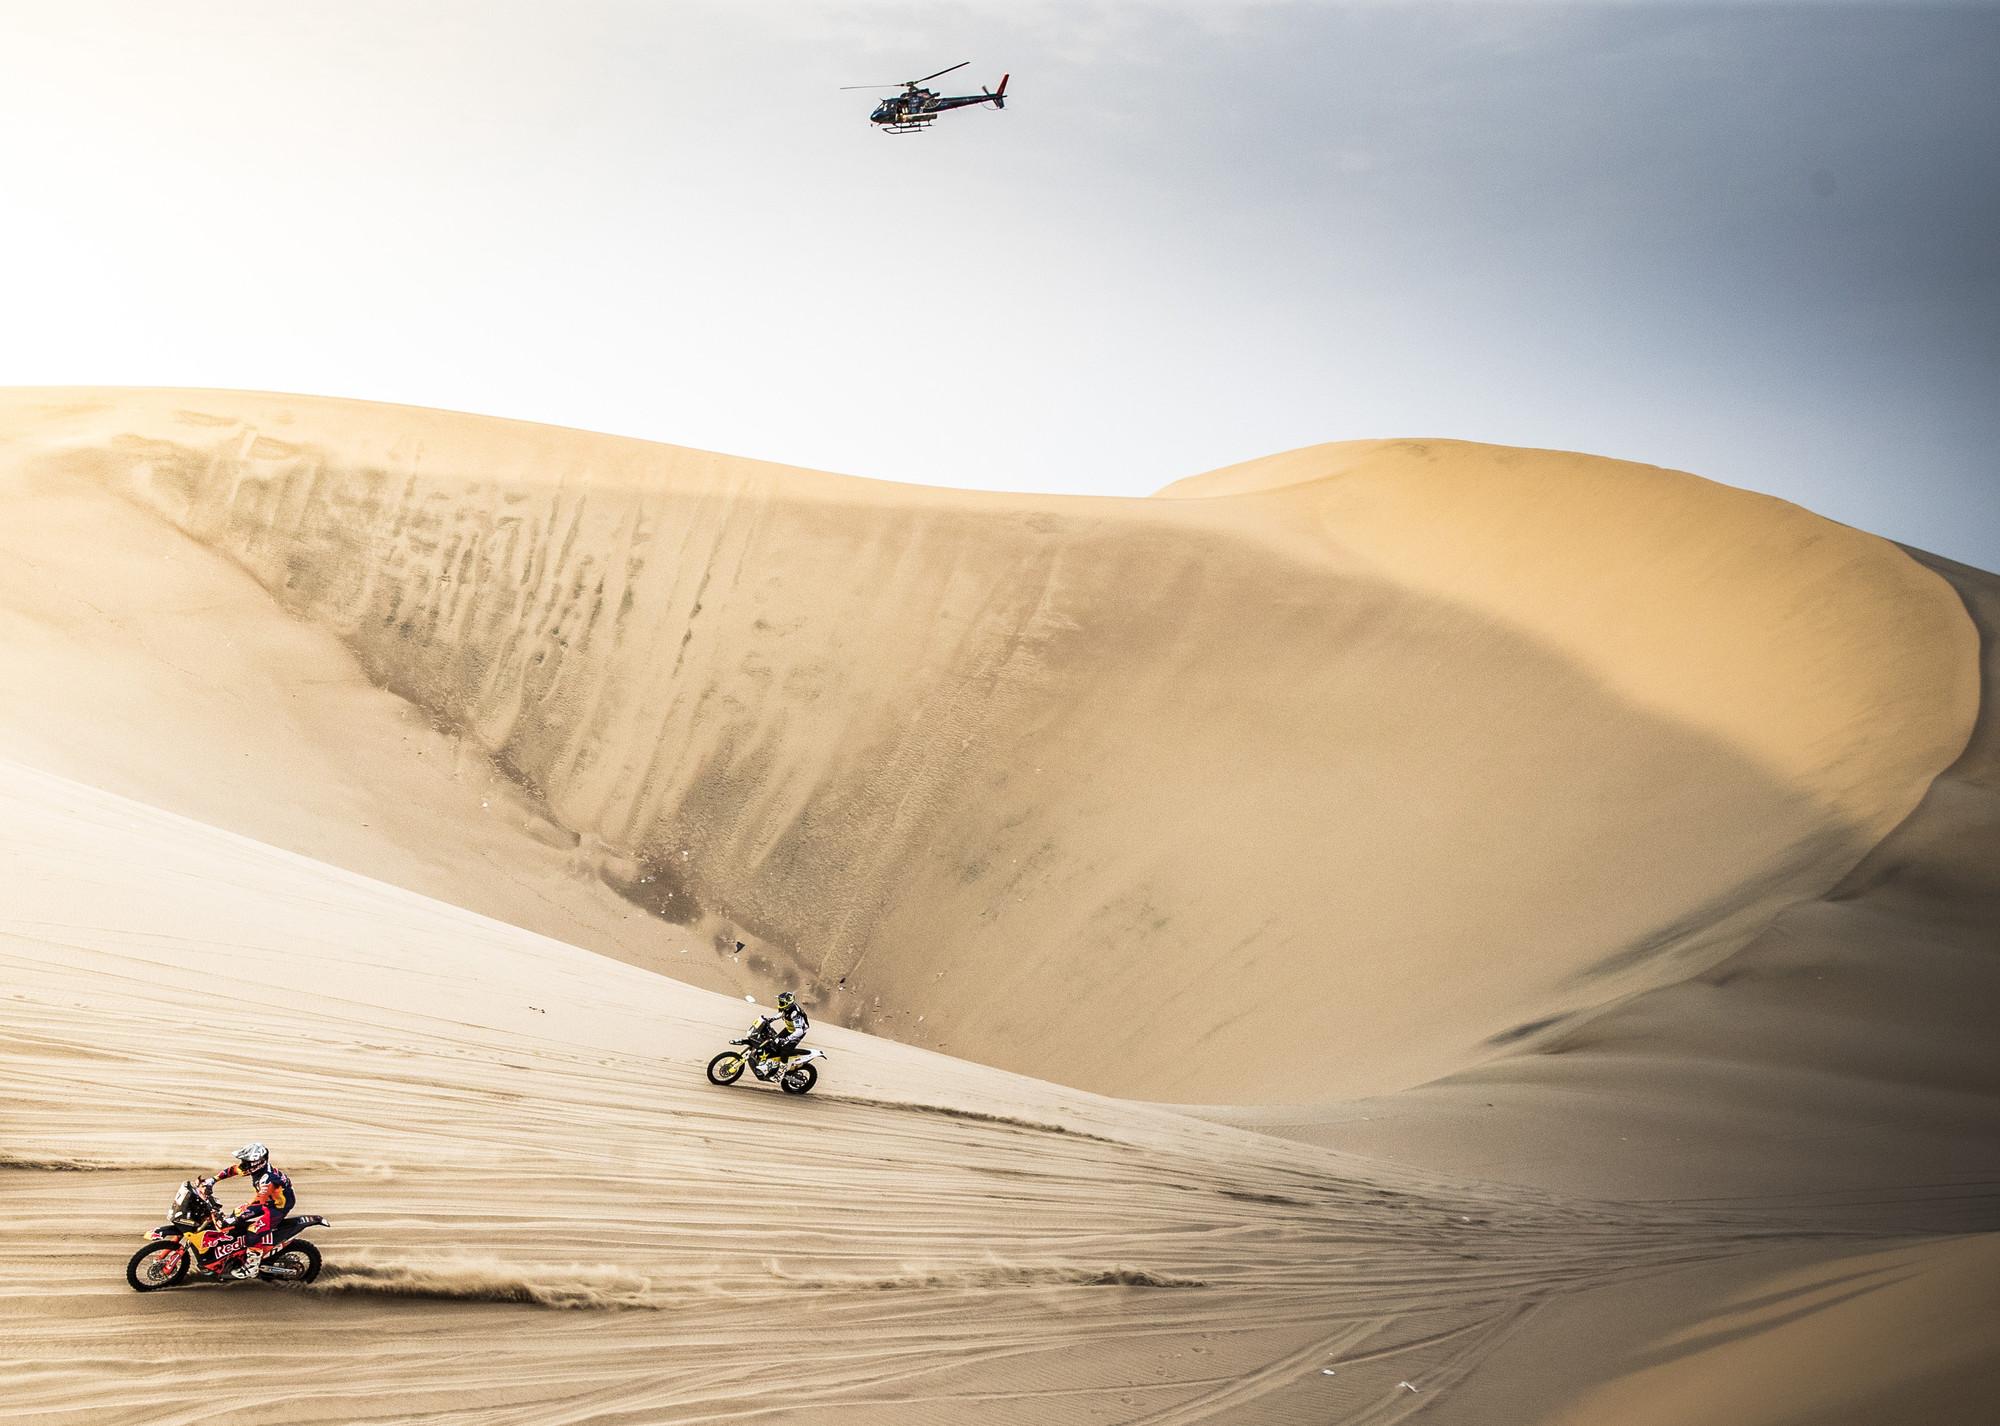 263174_misc_stage9_Red Bull KTM Factory Racing_Dakar2019_428.jpg